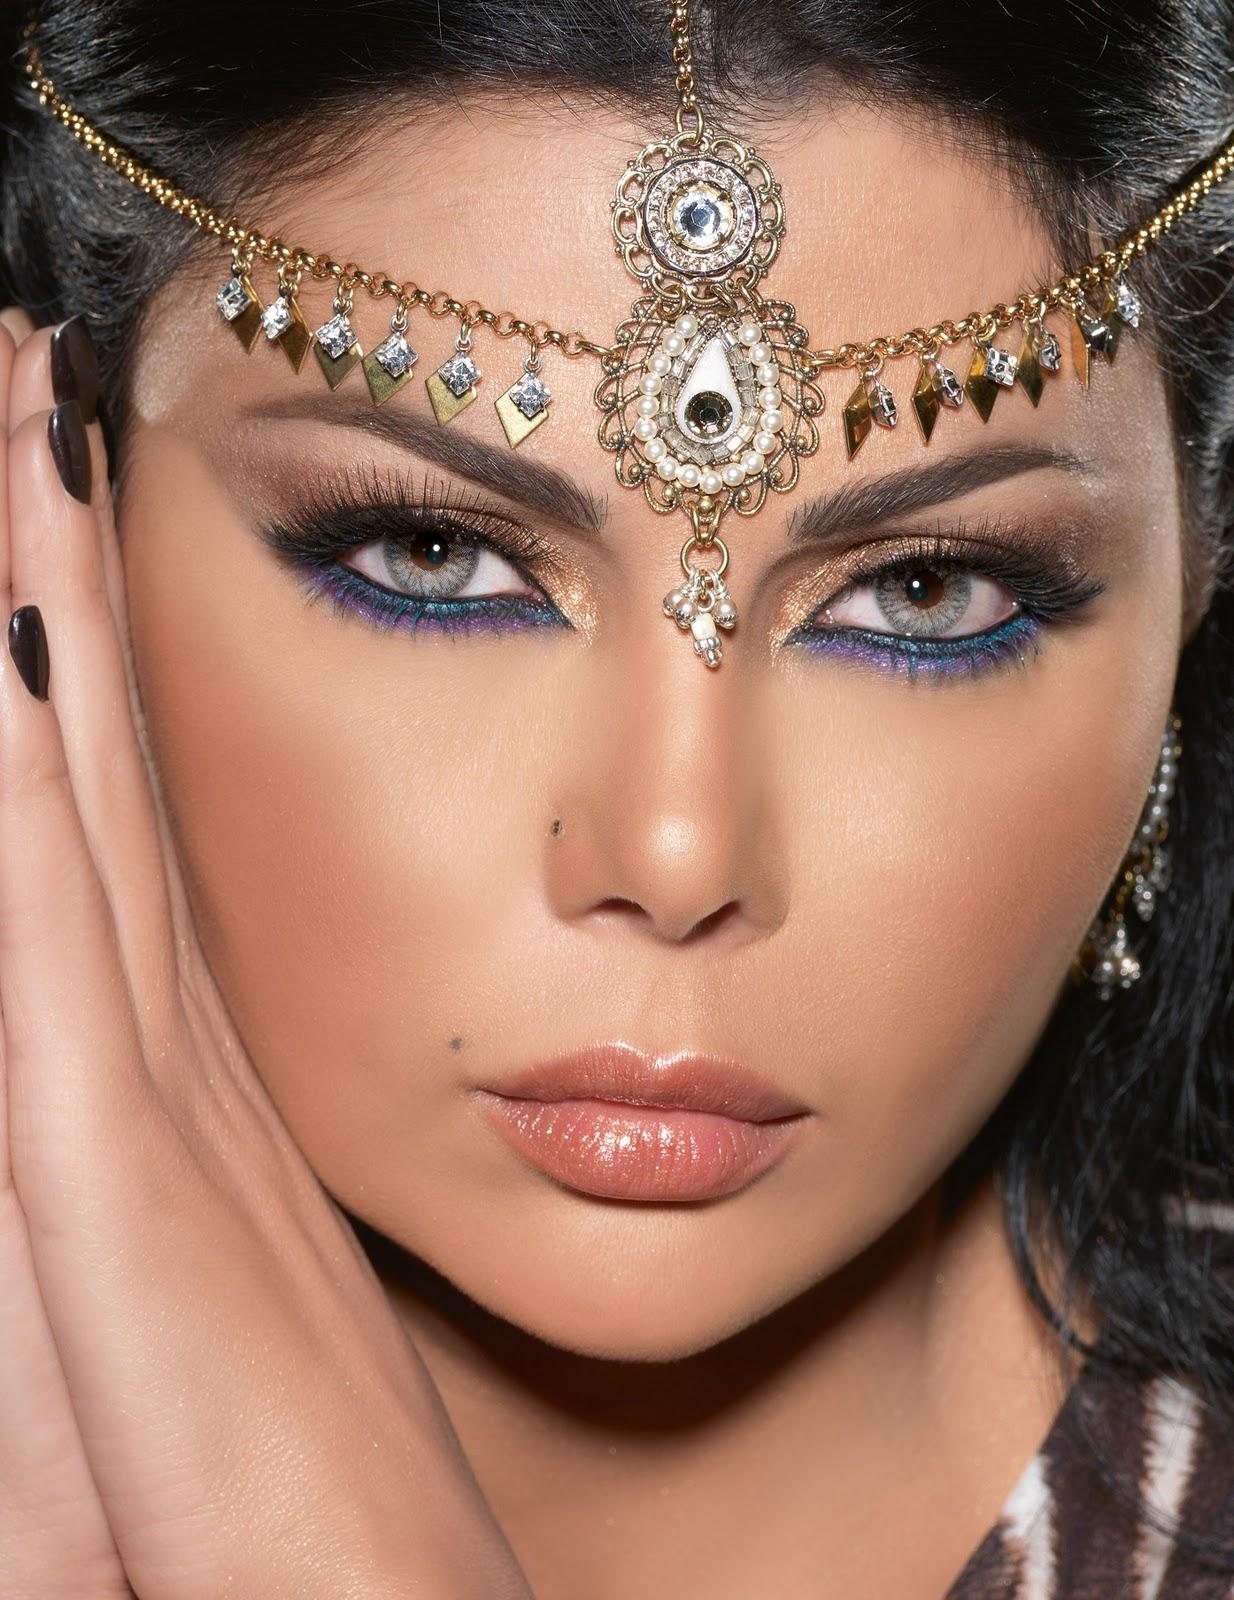 Wedding Makeup Tutorial Pixiwoo : Haifa Wehbe inspiration Pixiwoo.com